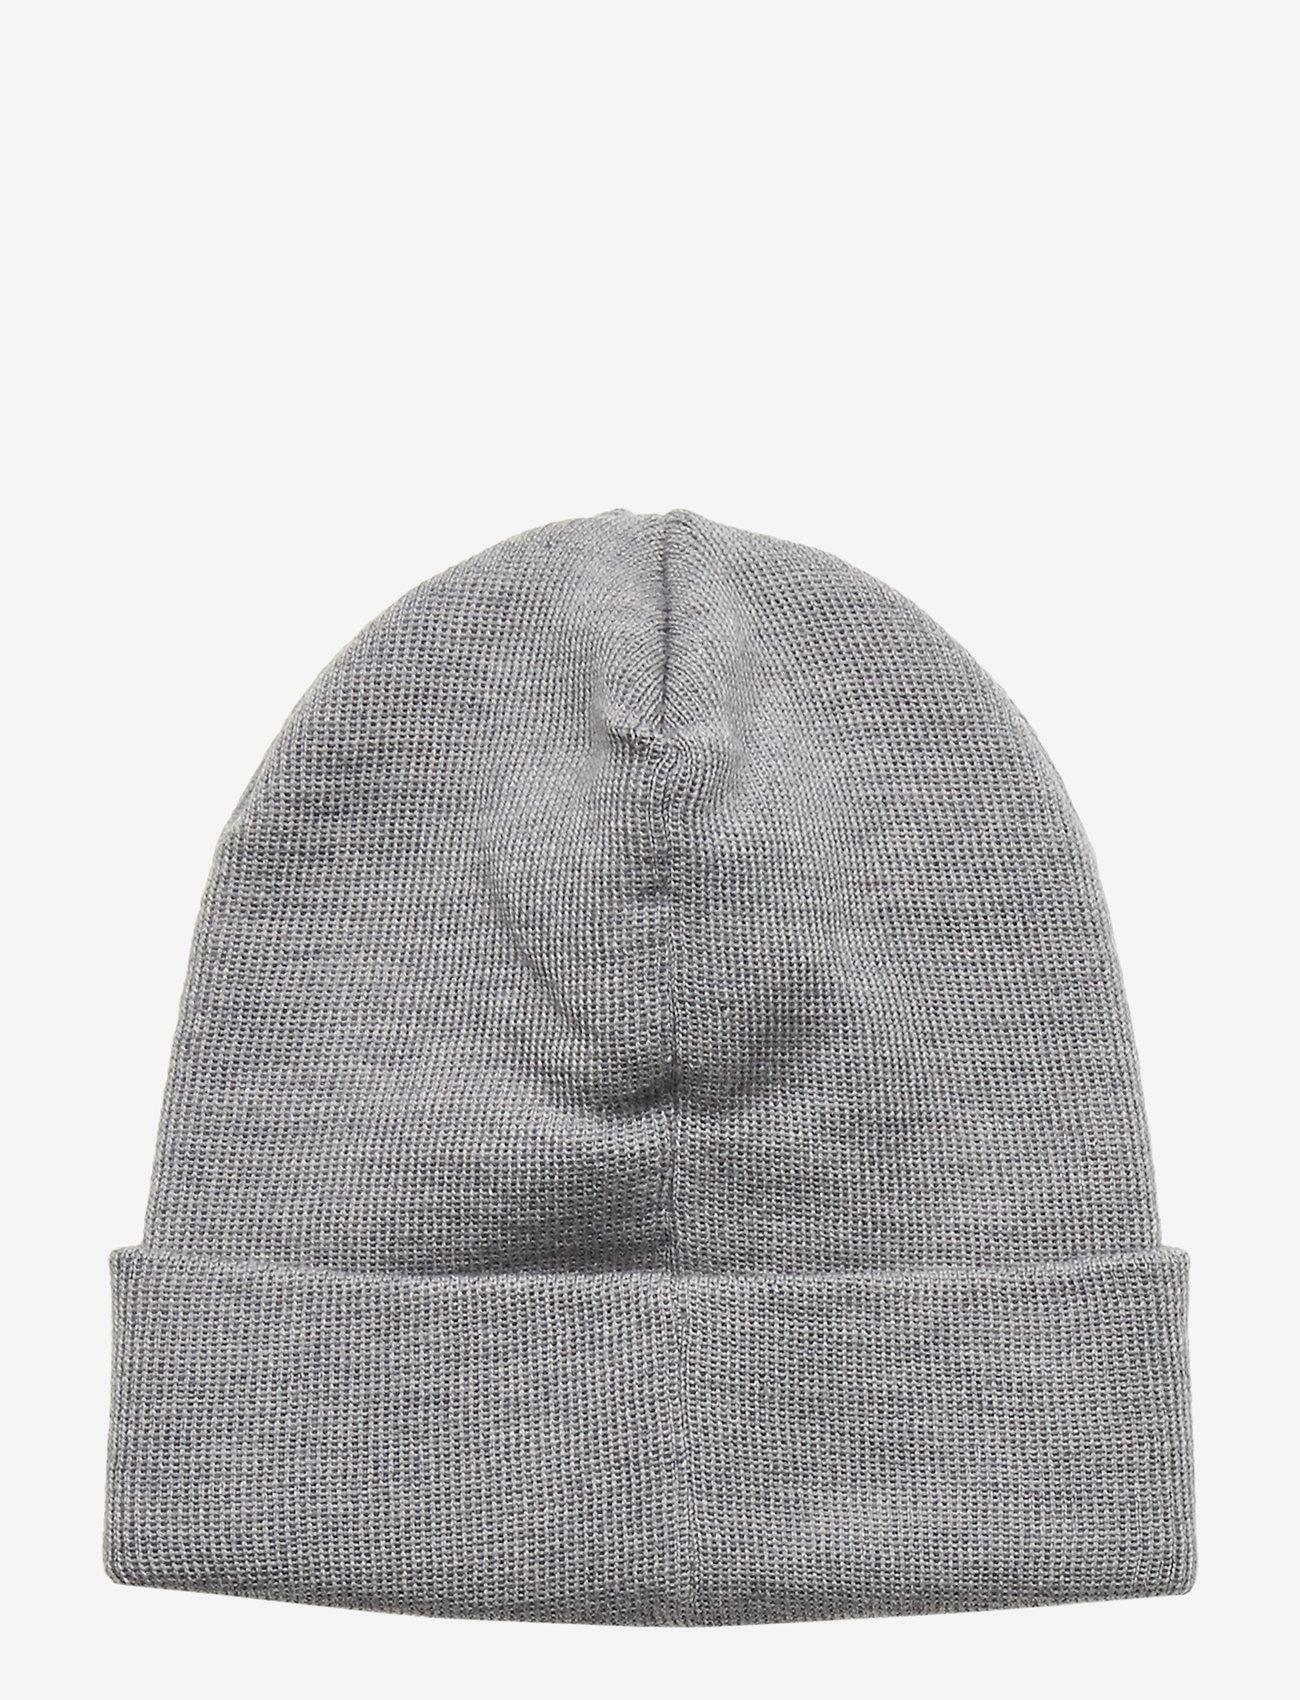 Wood Wood - Kai kids beanie - kapelusze - grey melange - 1